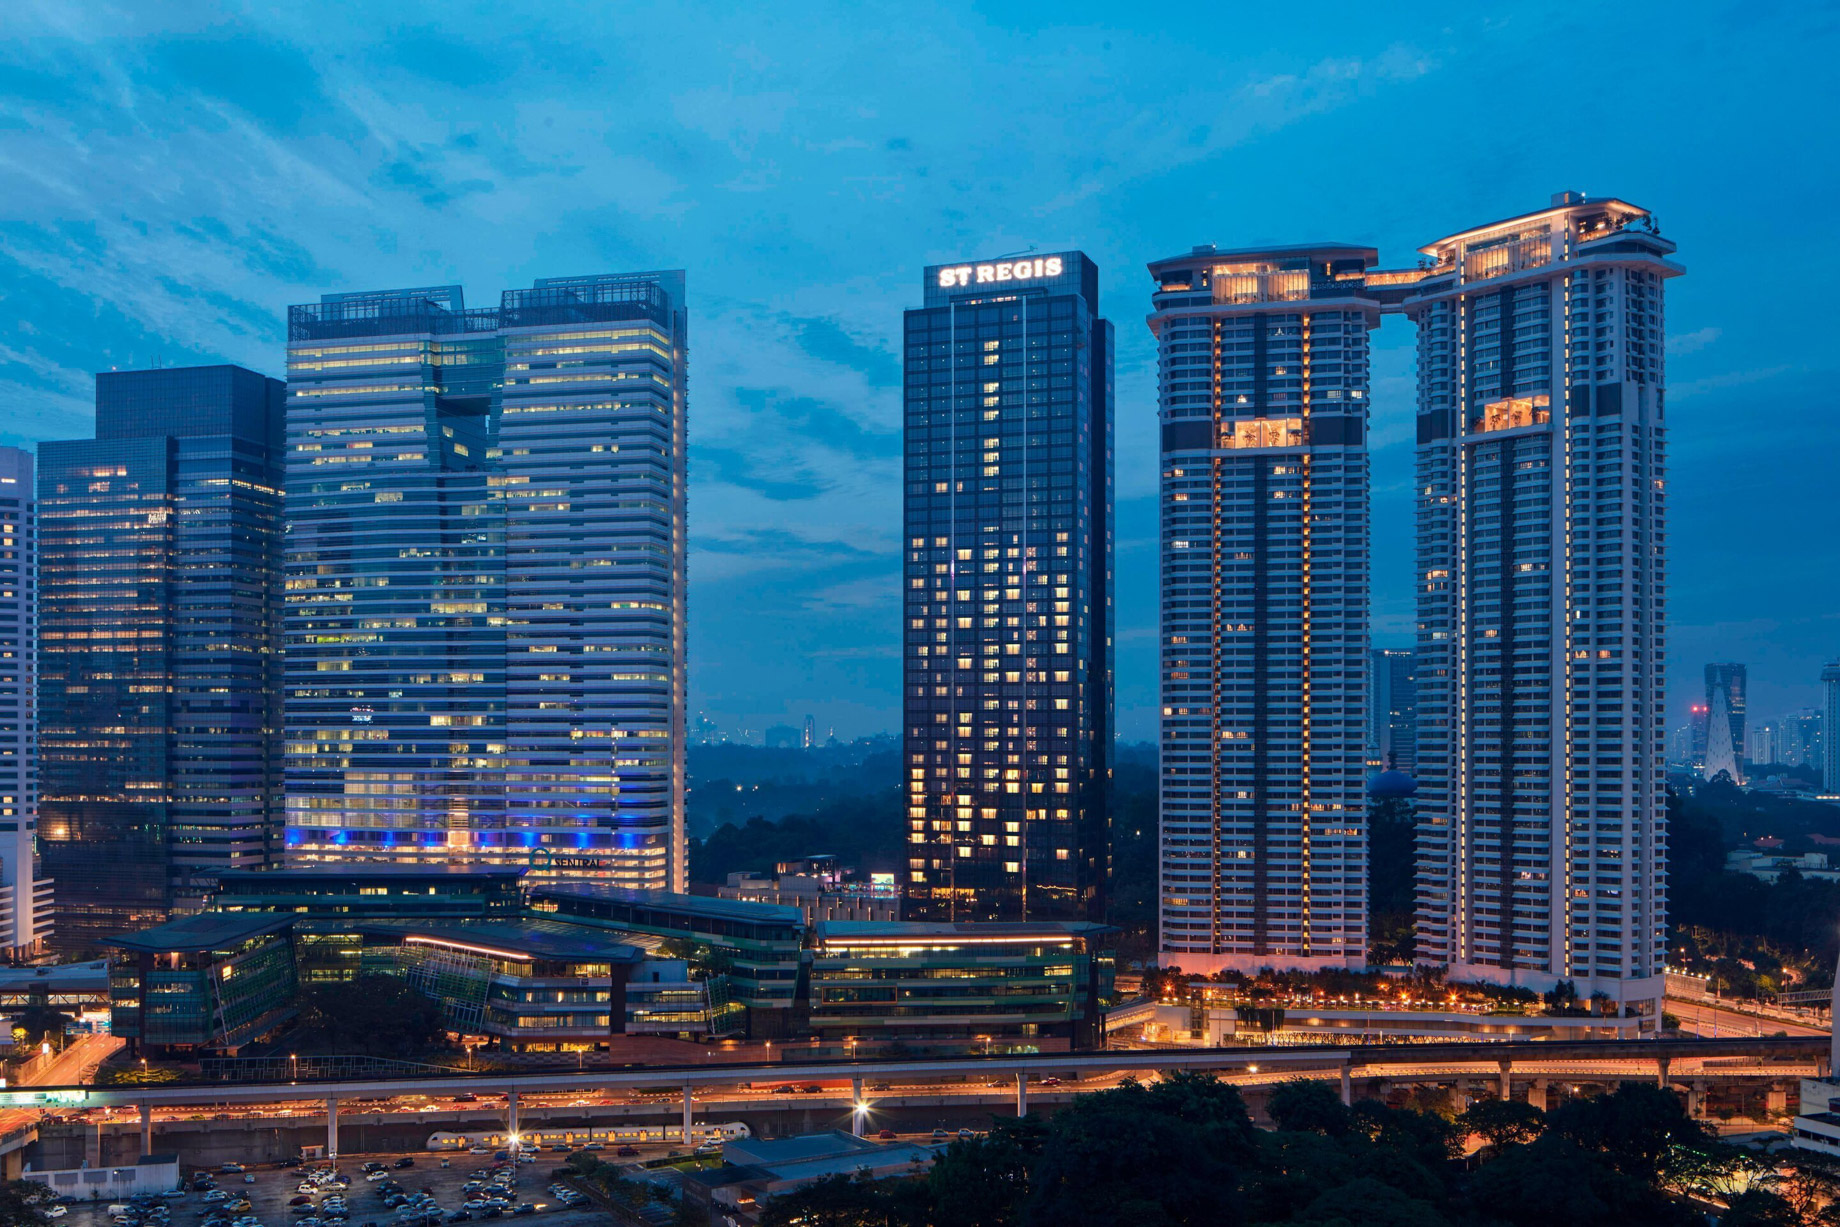 The St. Regis Kuala Lumpur Luxury Hotel - Kuala Lumpur, Malaysia - Hotel Exterior